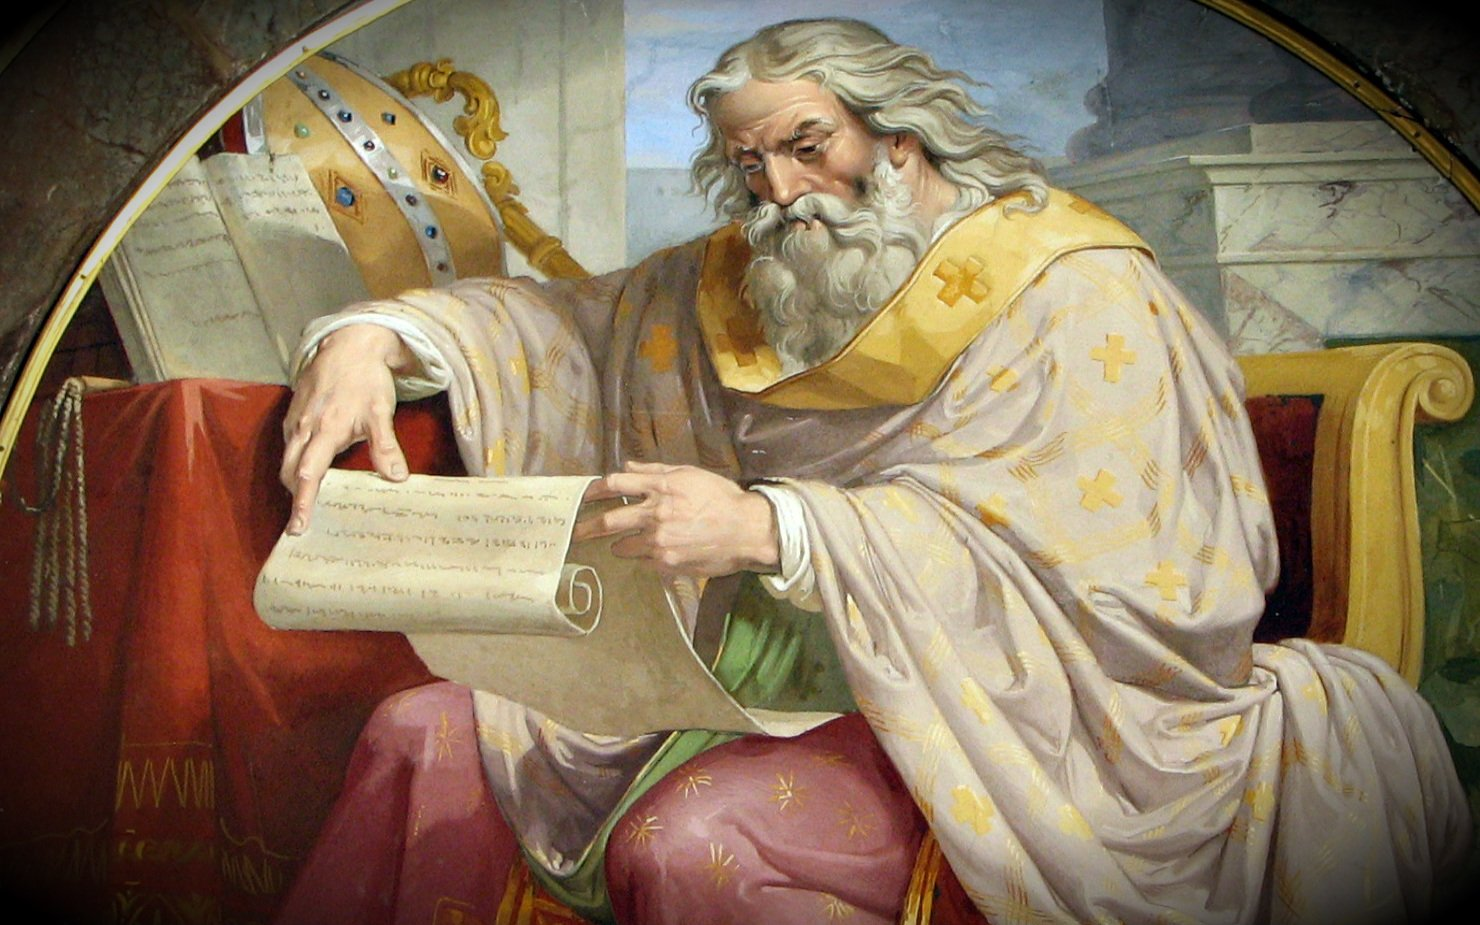 Some-Advice-On-Prayer-2-saint-ambrose-of-milan-1.jpg